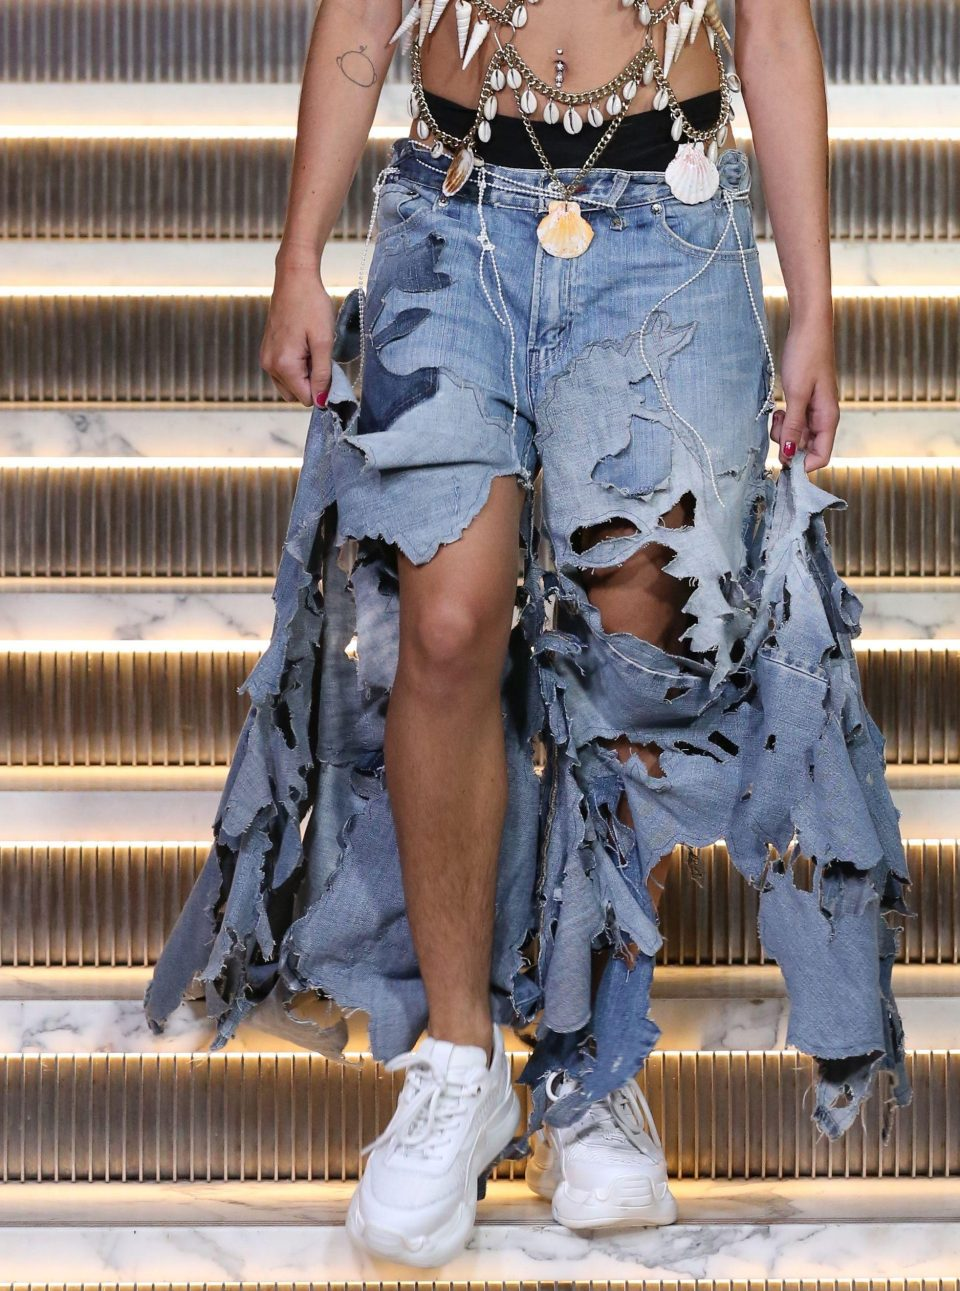 Lourdes Leon wears bizarre shell bralet and has hairy legs on New York Fashion Week runway